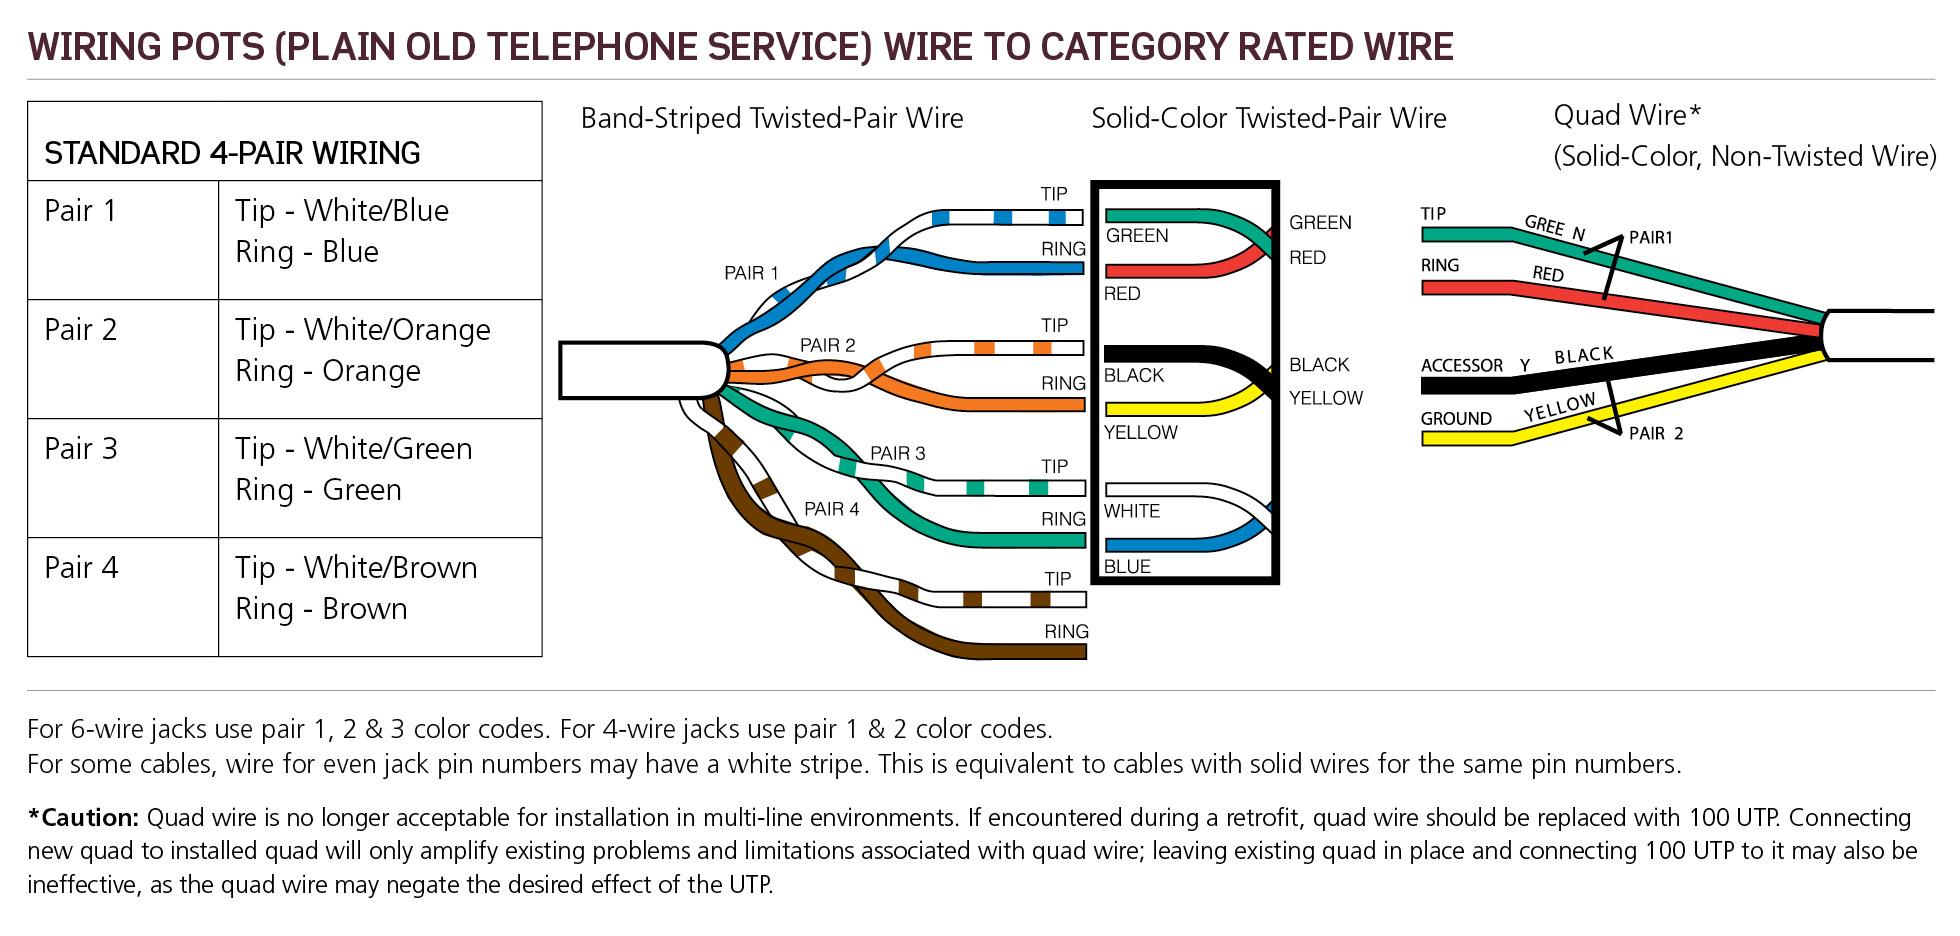 Rj45 Jack Wiring Leviton Rj45 Jack Wire Diagram Wiring Diagrams – one.net